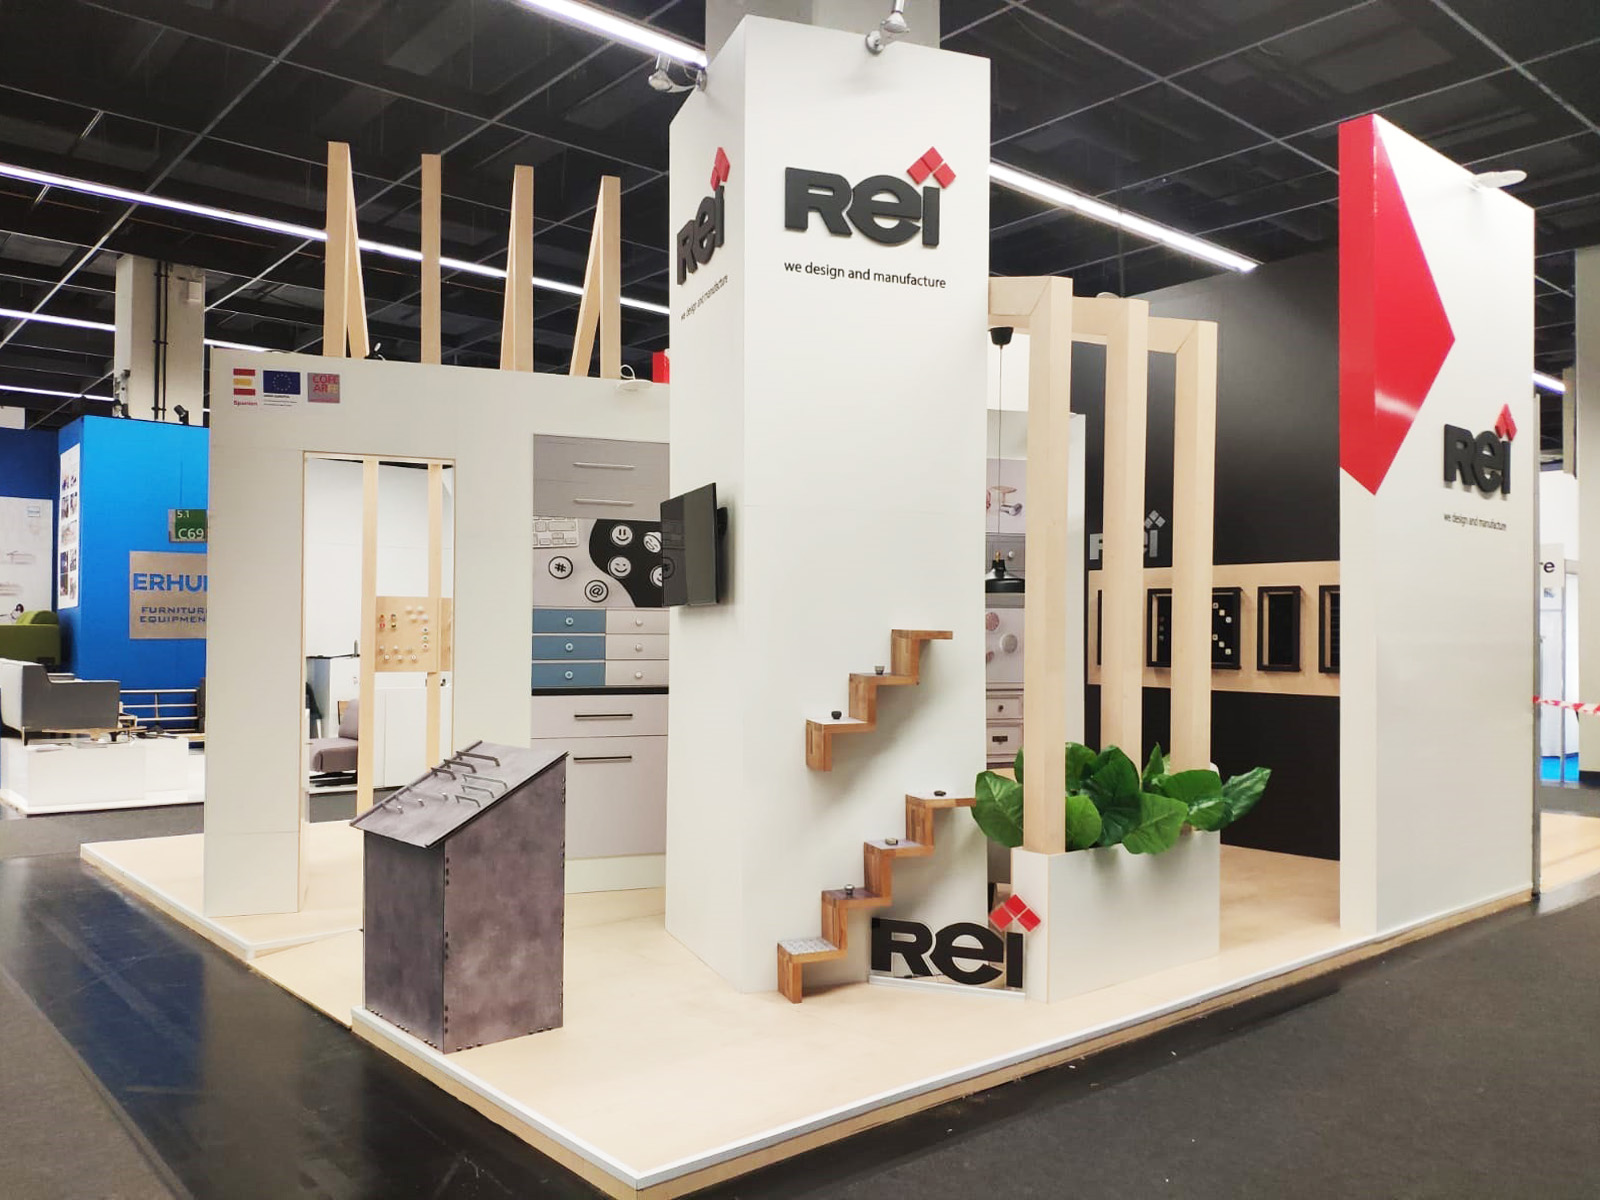 REI 01 - REI - Interzum